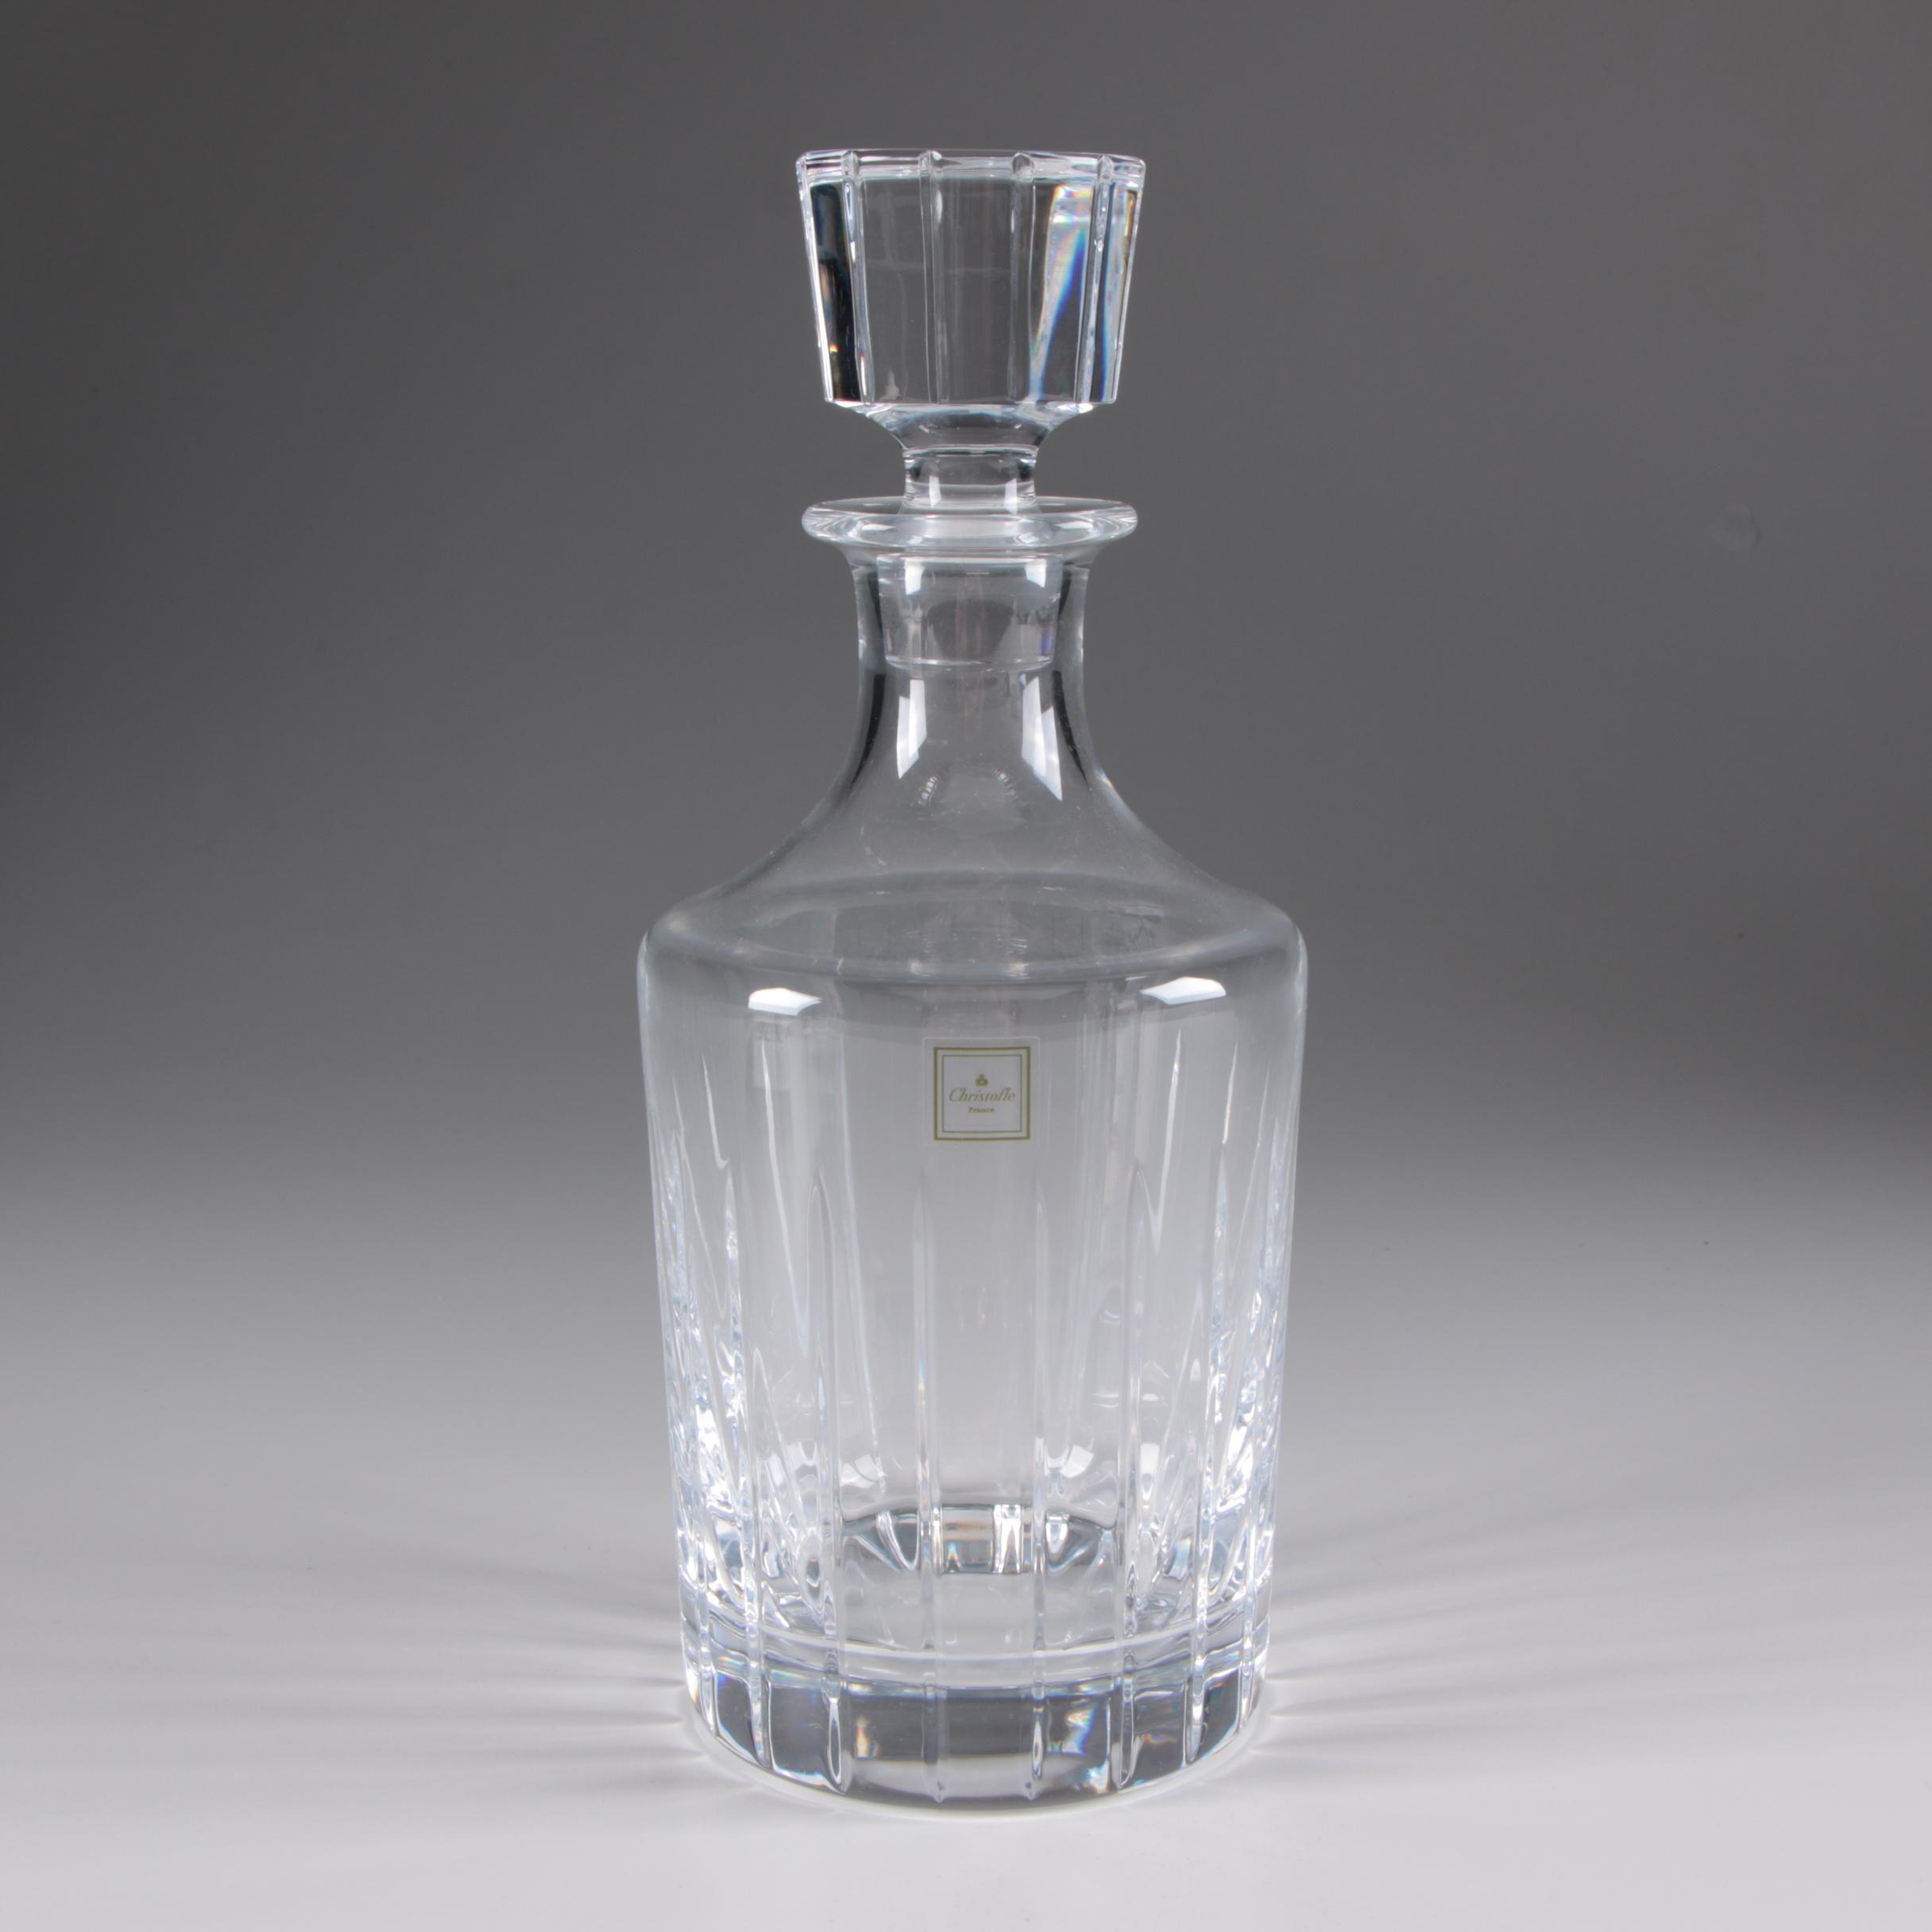 Christofle Crystal Decanter